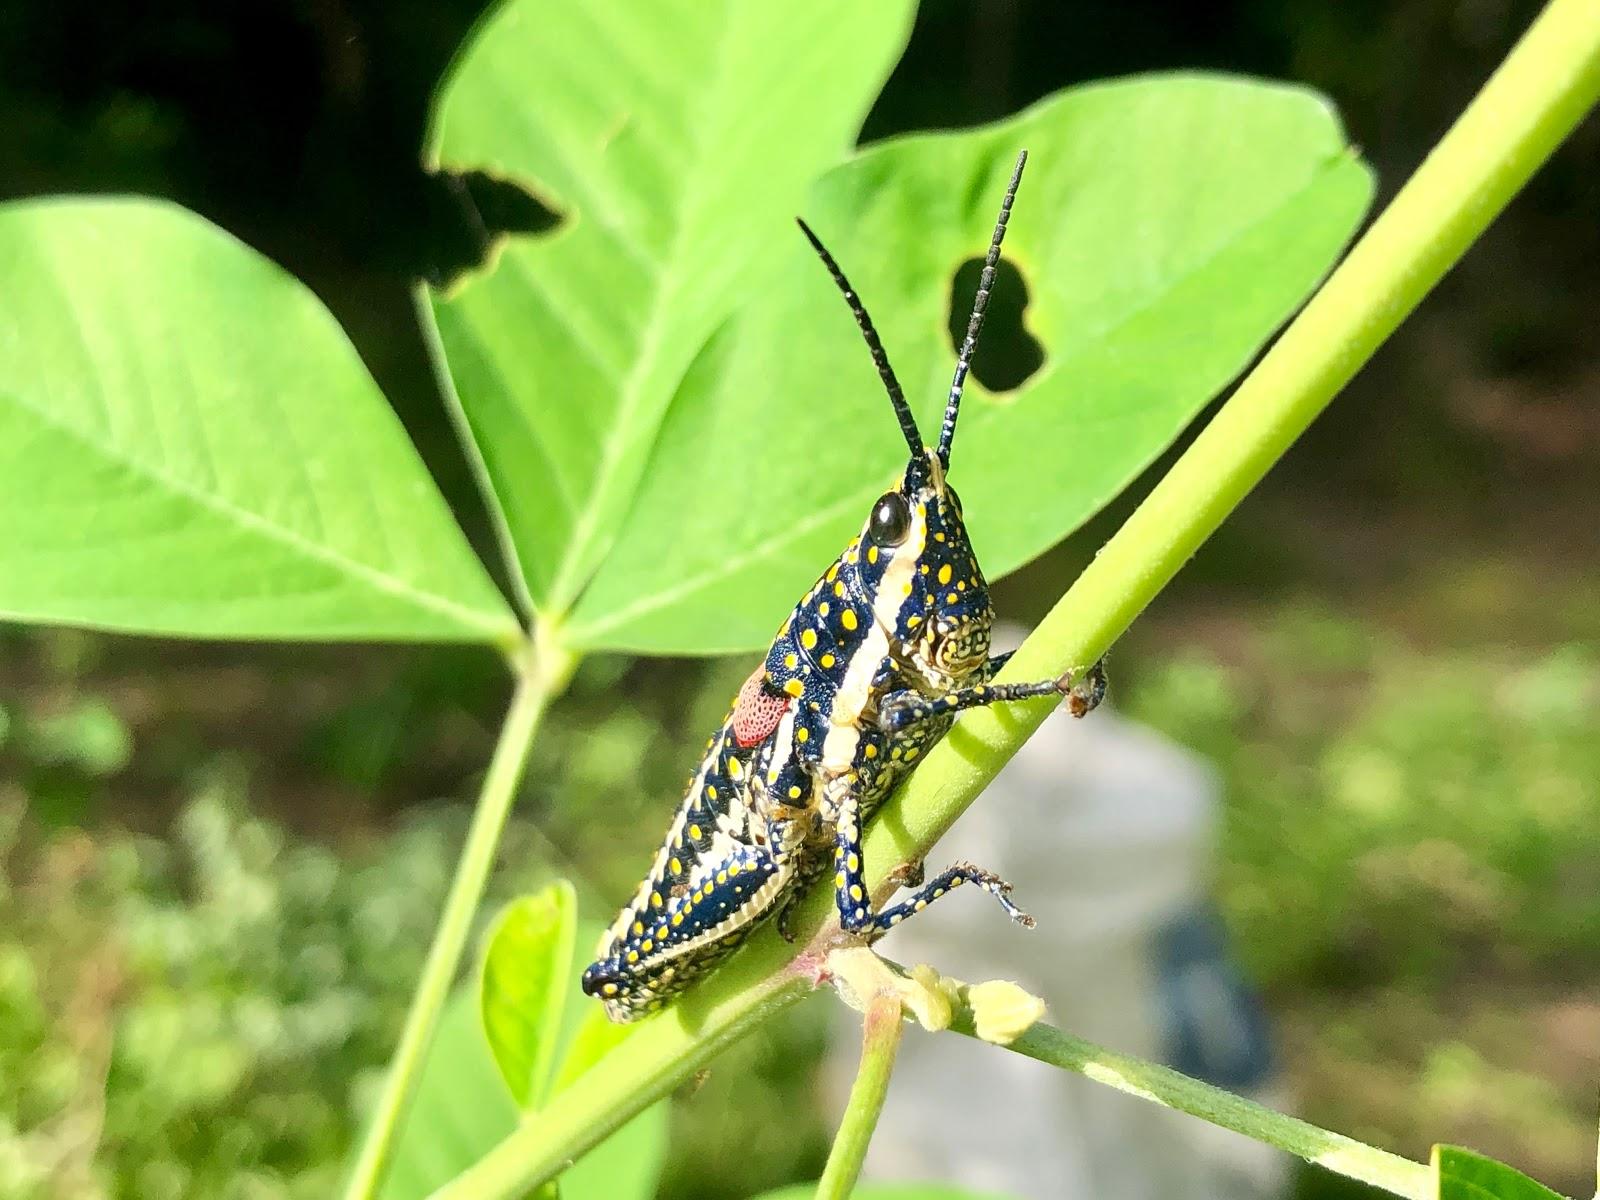 Monistria pustulifera - blistered grasshopper (edible)